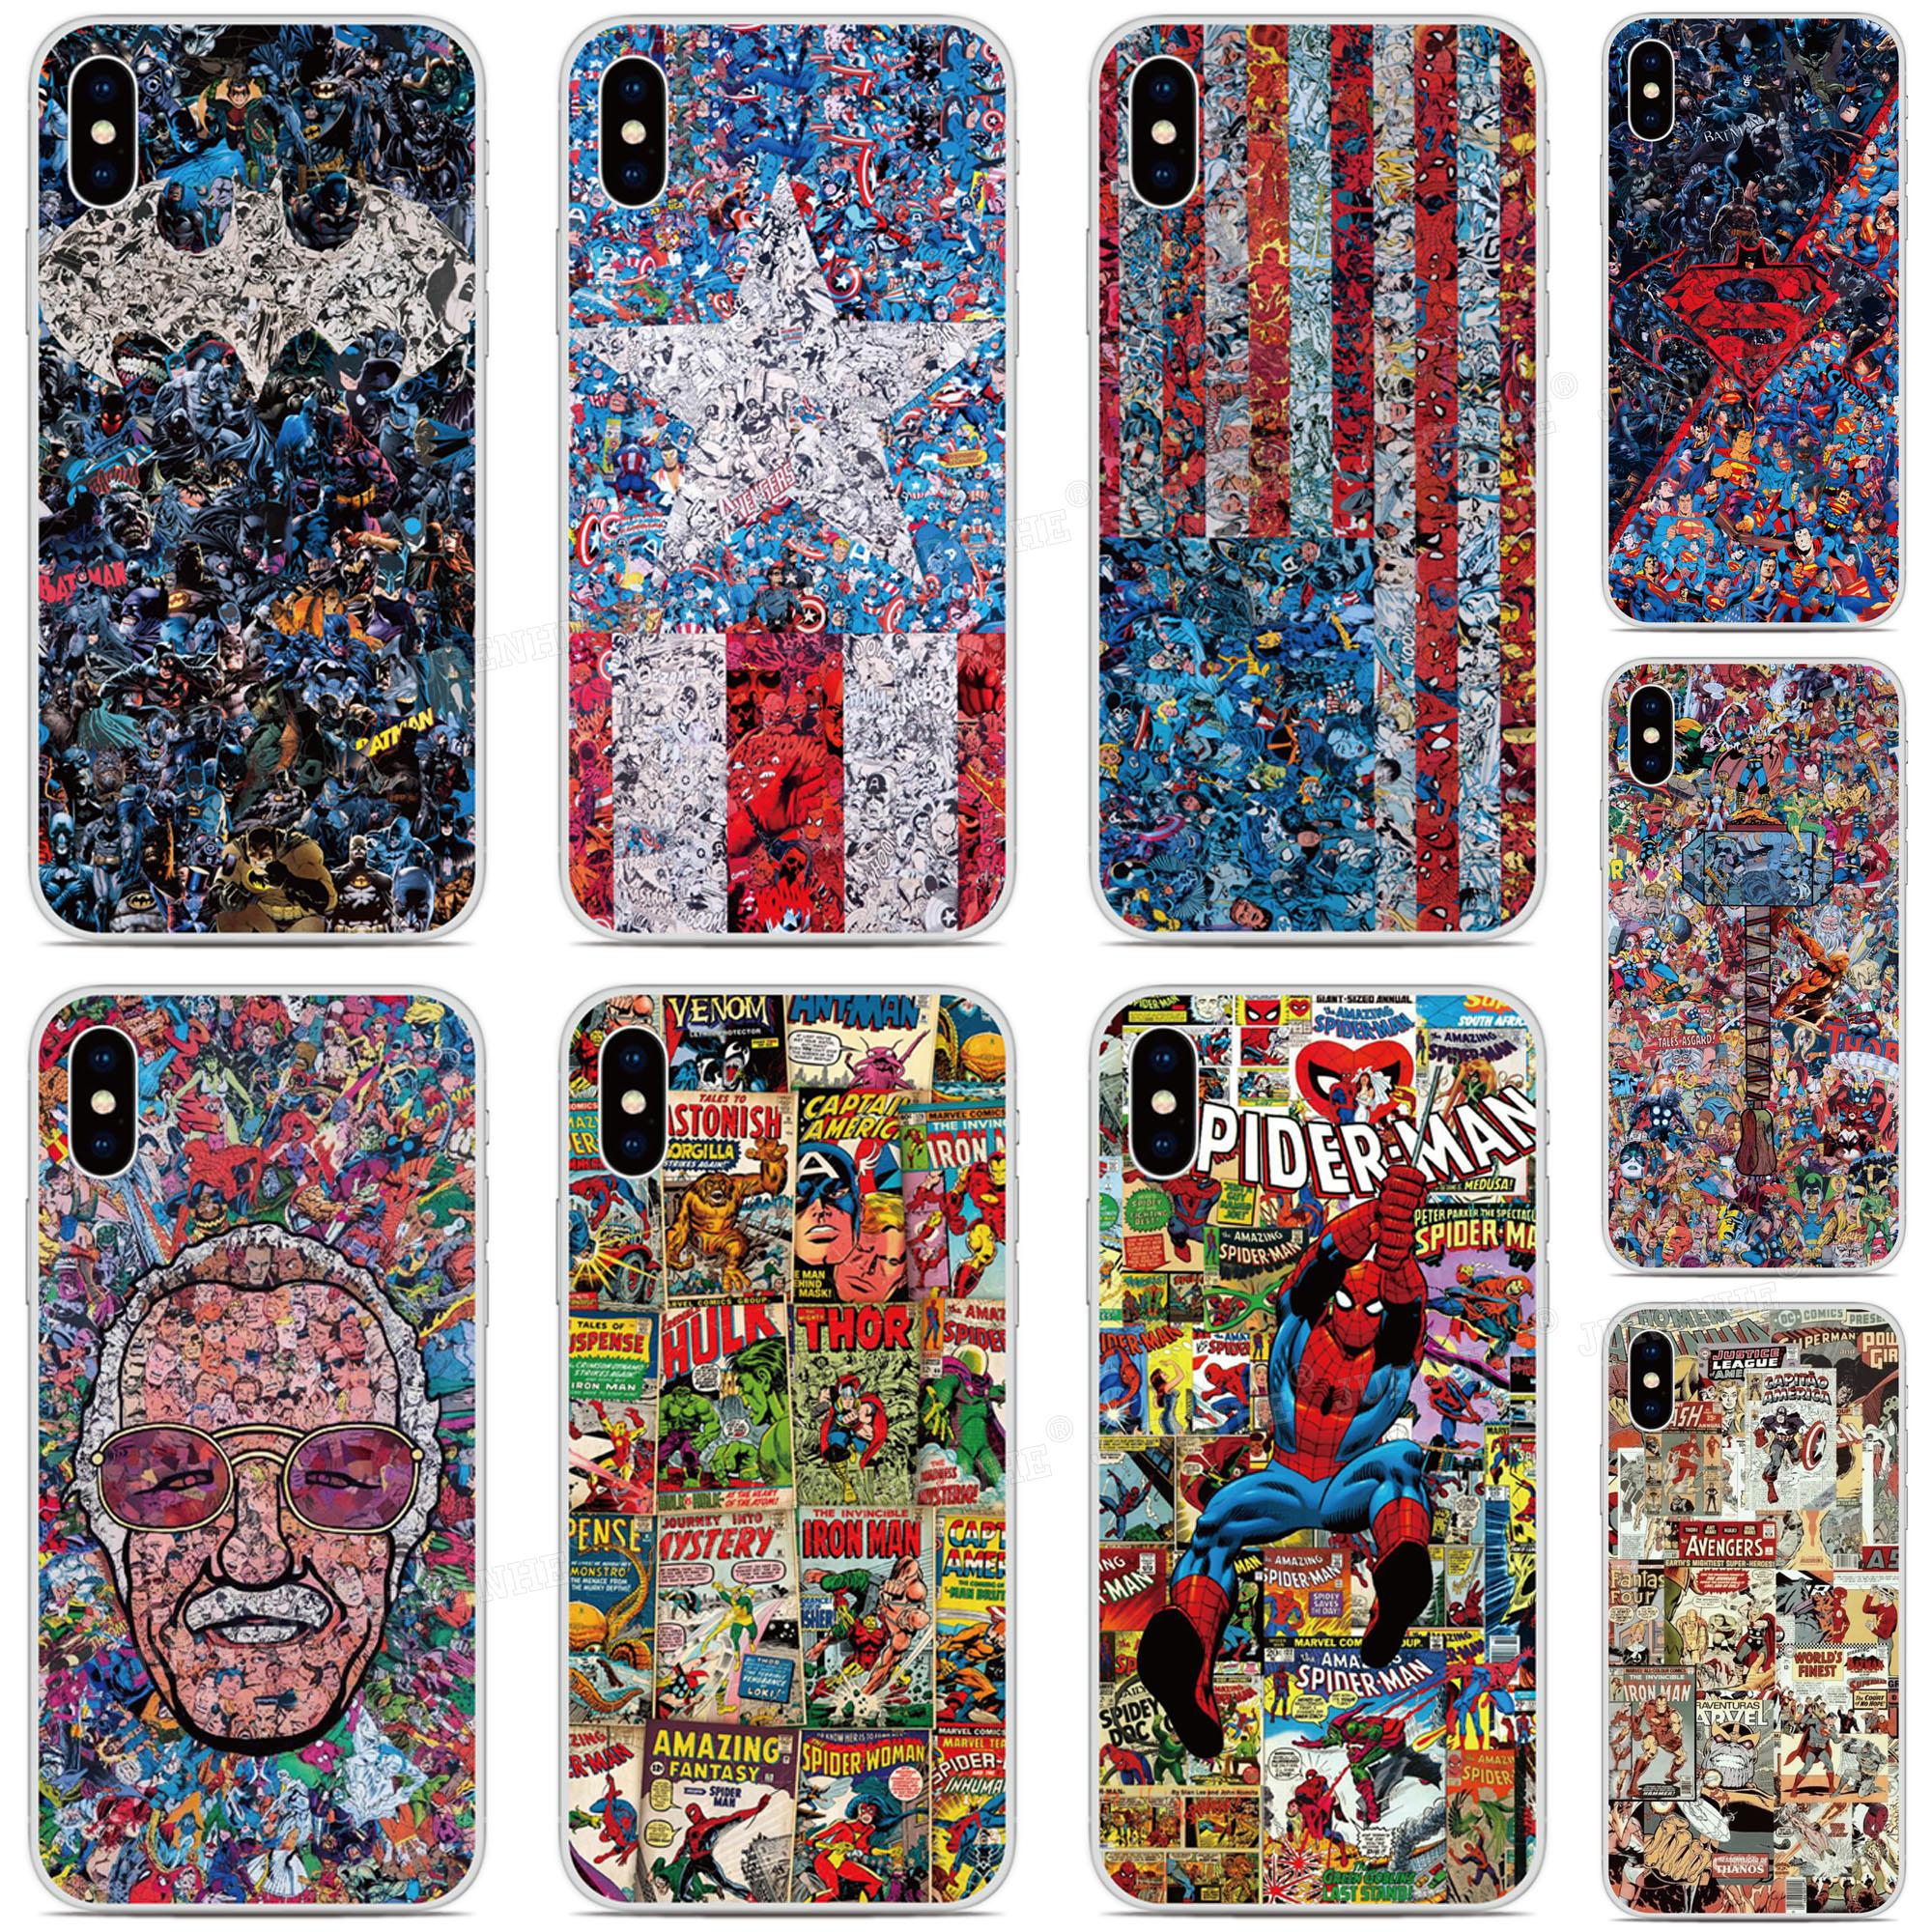 Batman Super Hero Phone Case For BlackBerry-Priv KEYone KEY 2 Motion Passport Q30 Z10 Z30 Q10 DTEK50 DTEK60 DTEK70 Cover Capa